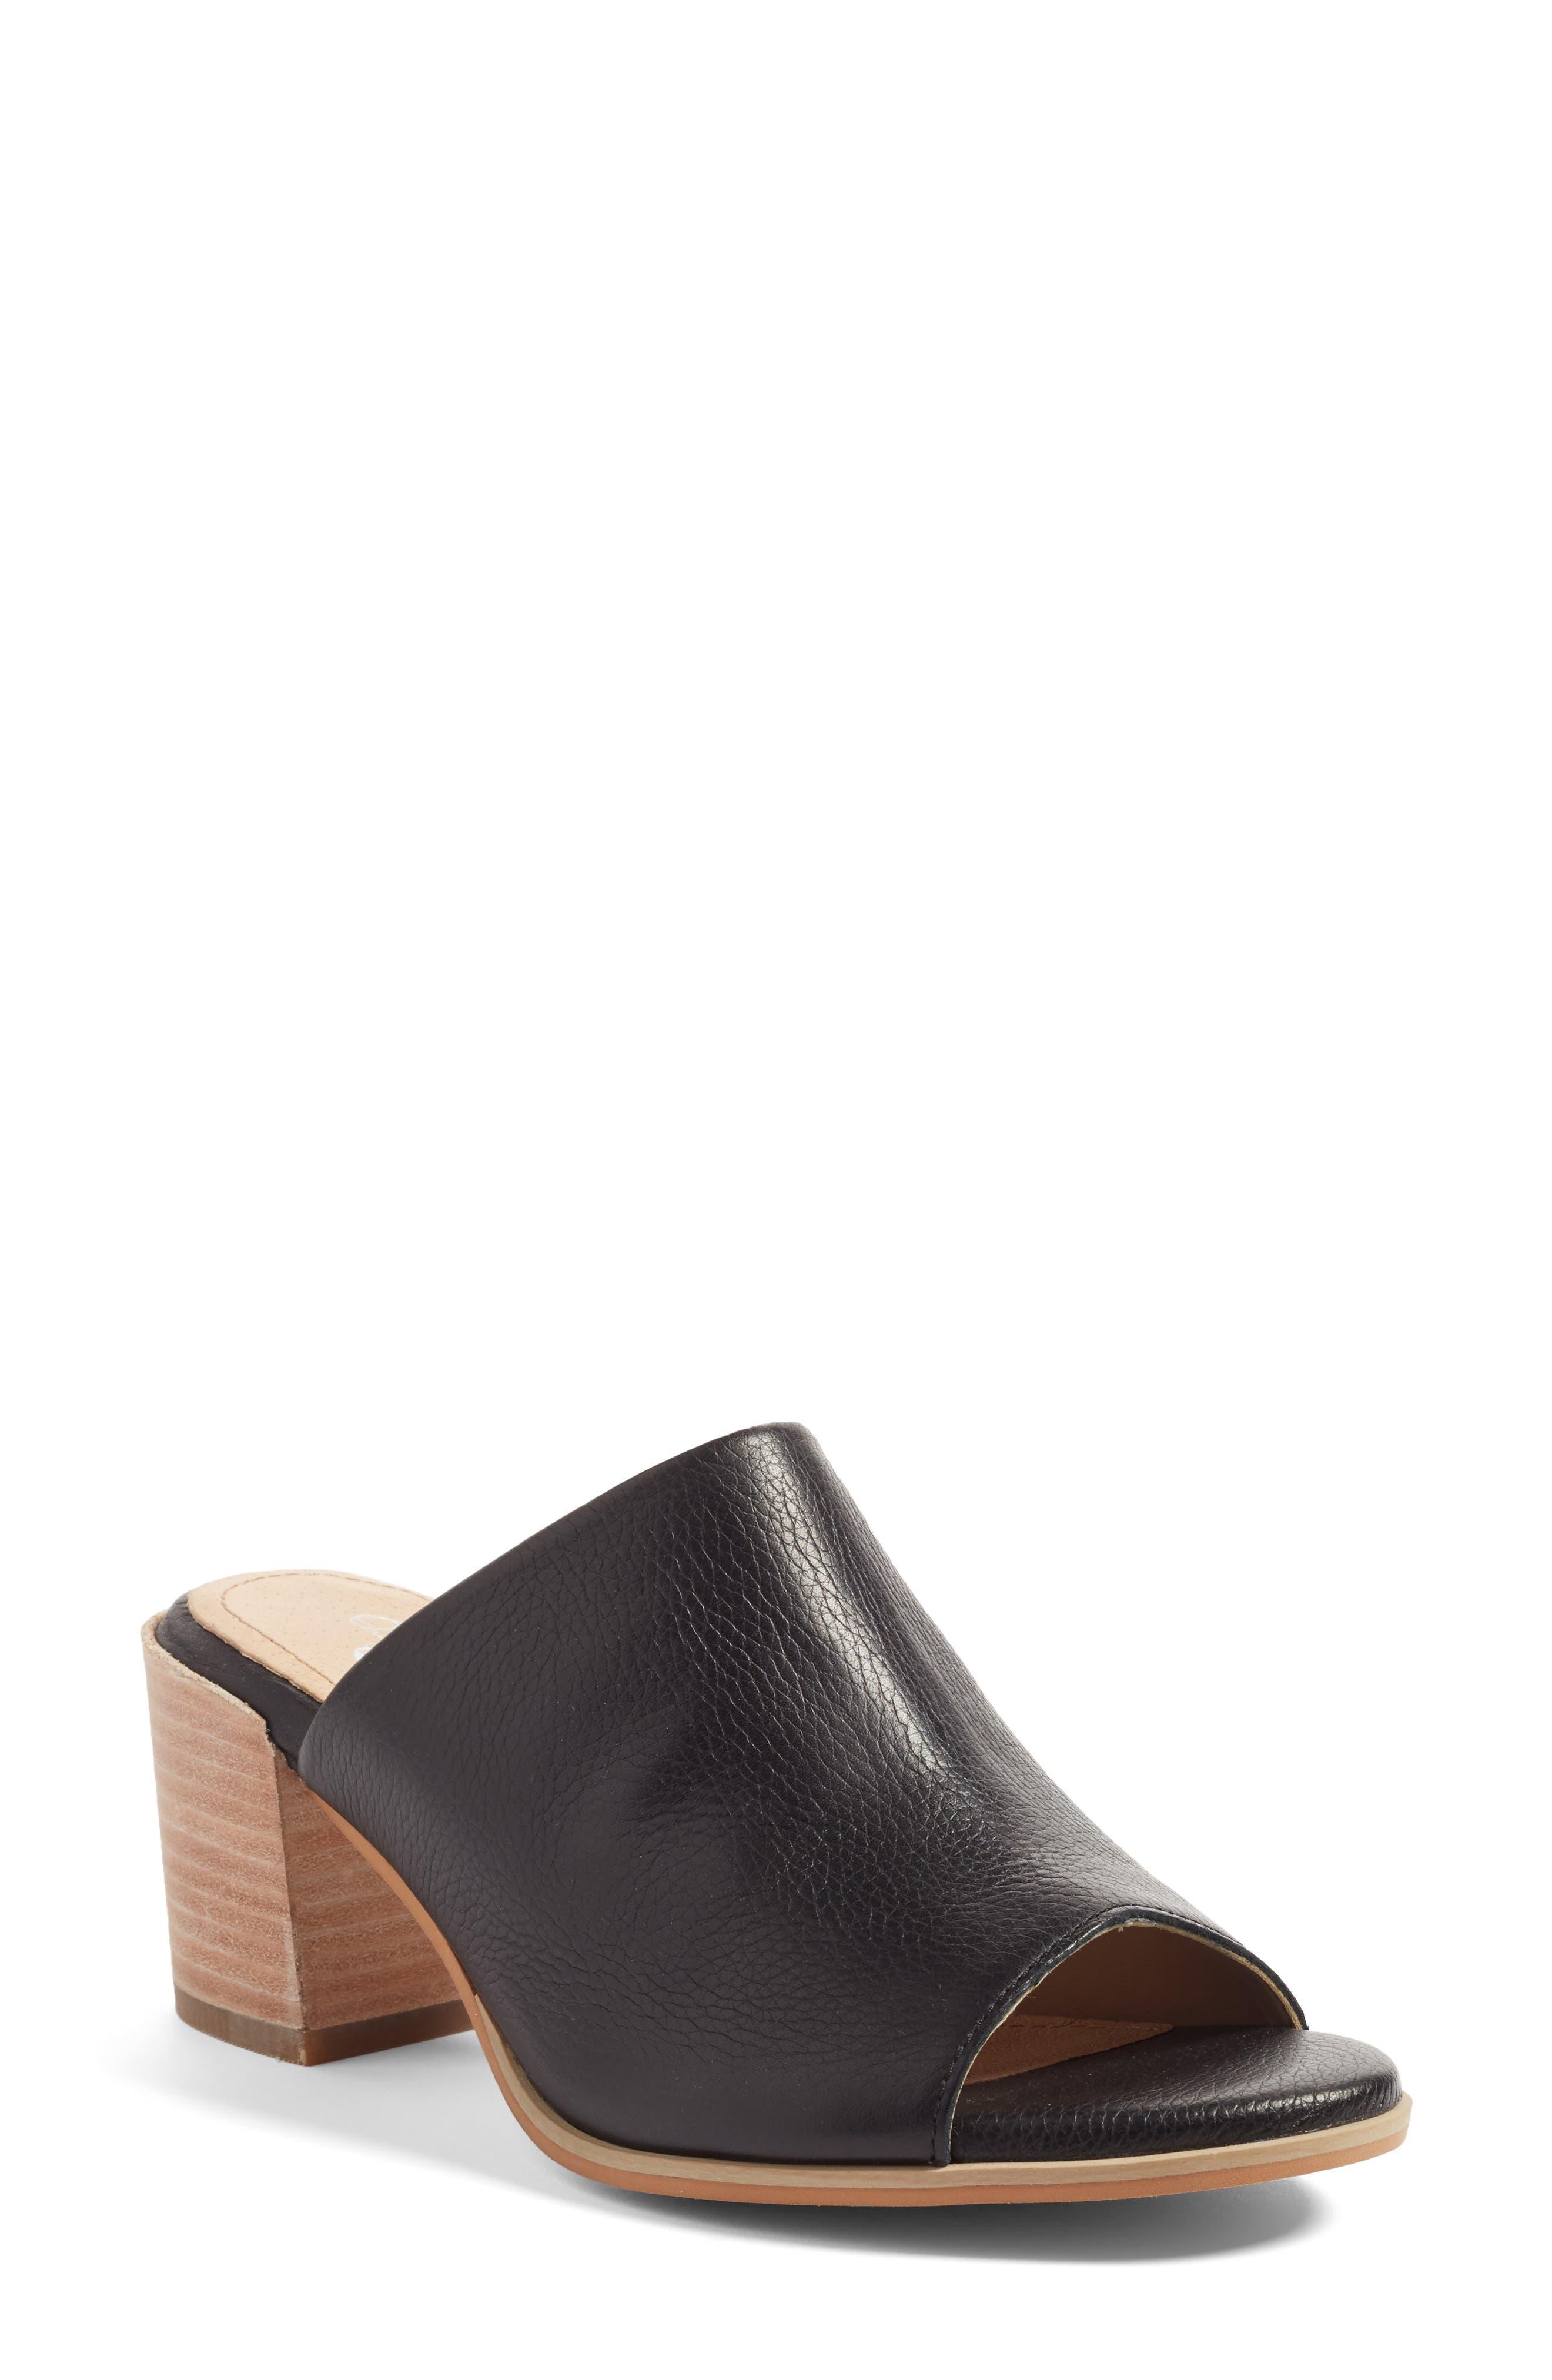 Malin Block Heel Sandal,                             Main thumbnail 1, color,                             001